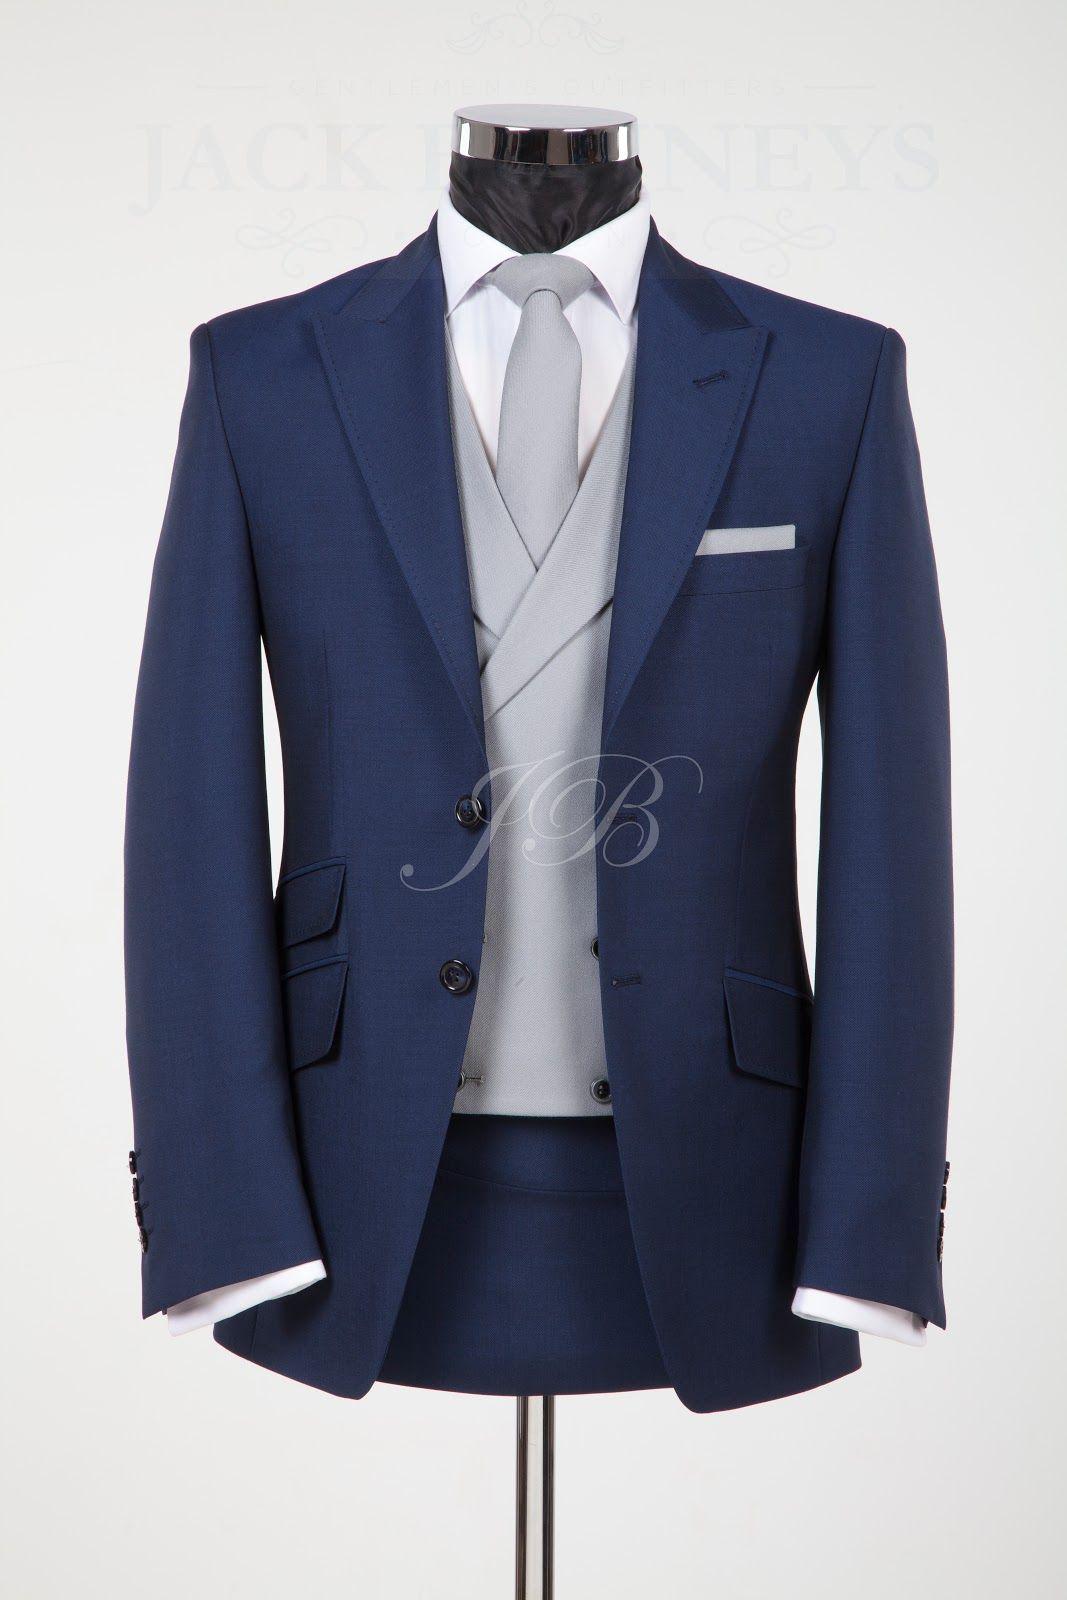 _MG_6540.jpg (1067×1600) | Godfrey | Pinterest | Wedding suit hire ...